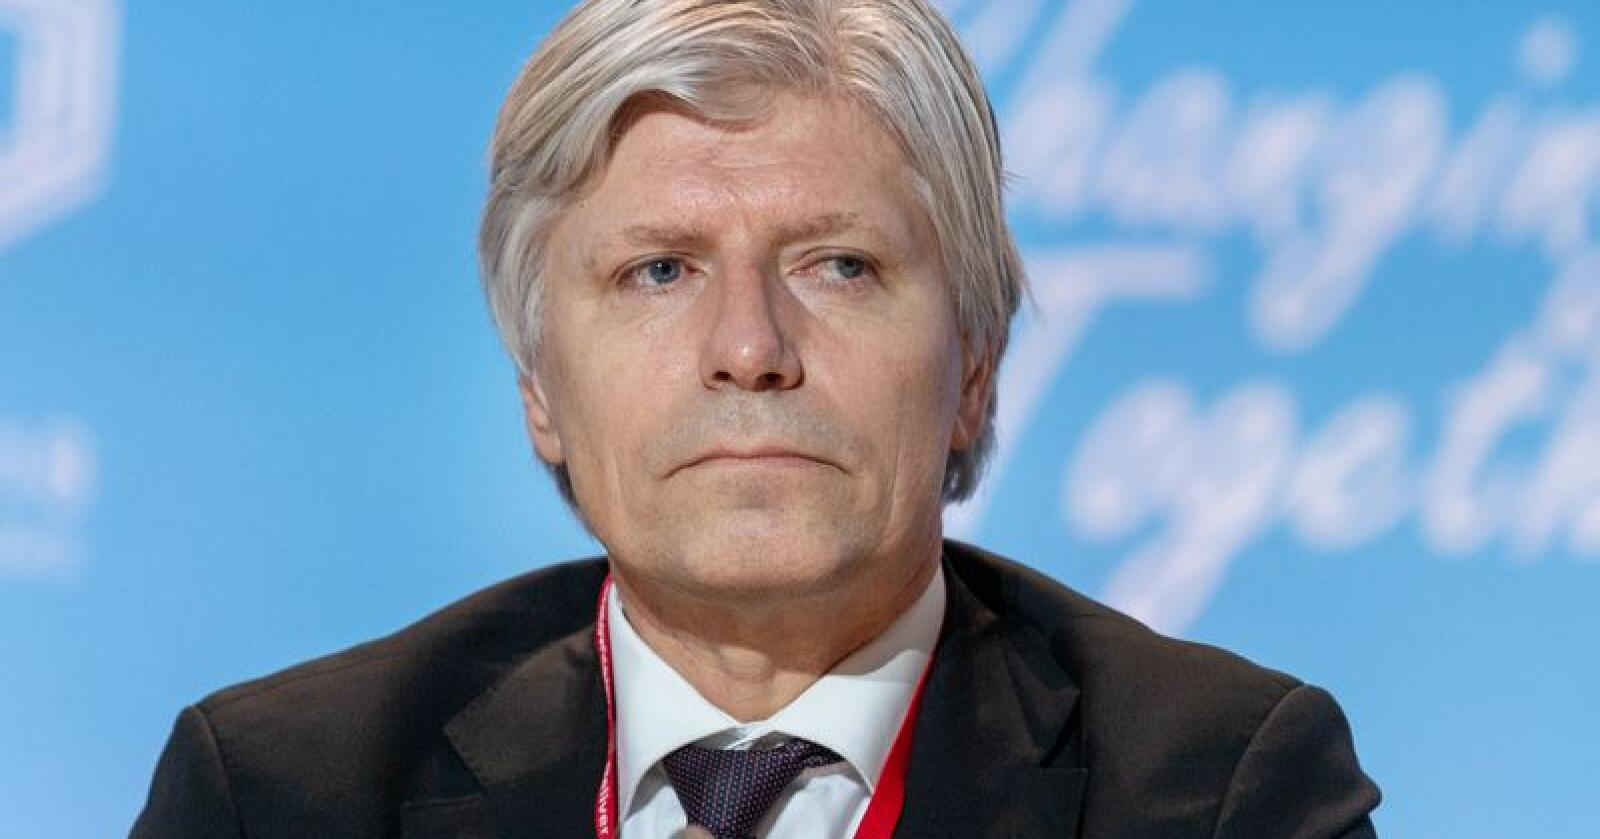 Klima- og miljøminister Ola Elvestuen (V) mener at innholdet i FNs naturpanels rapport er alarmerende. Foto: Monika Skolimowska/ DPA / NTB scanpix